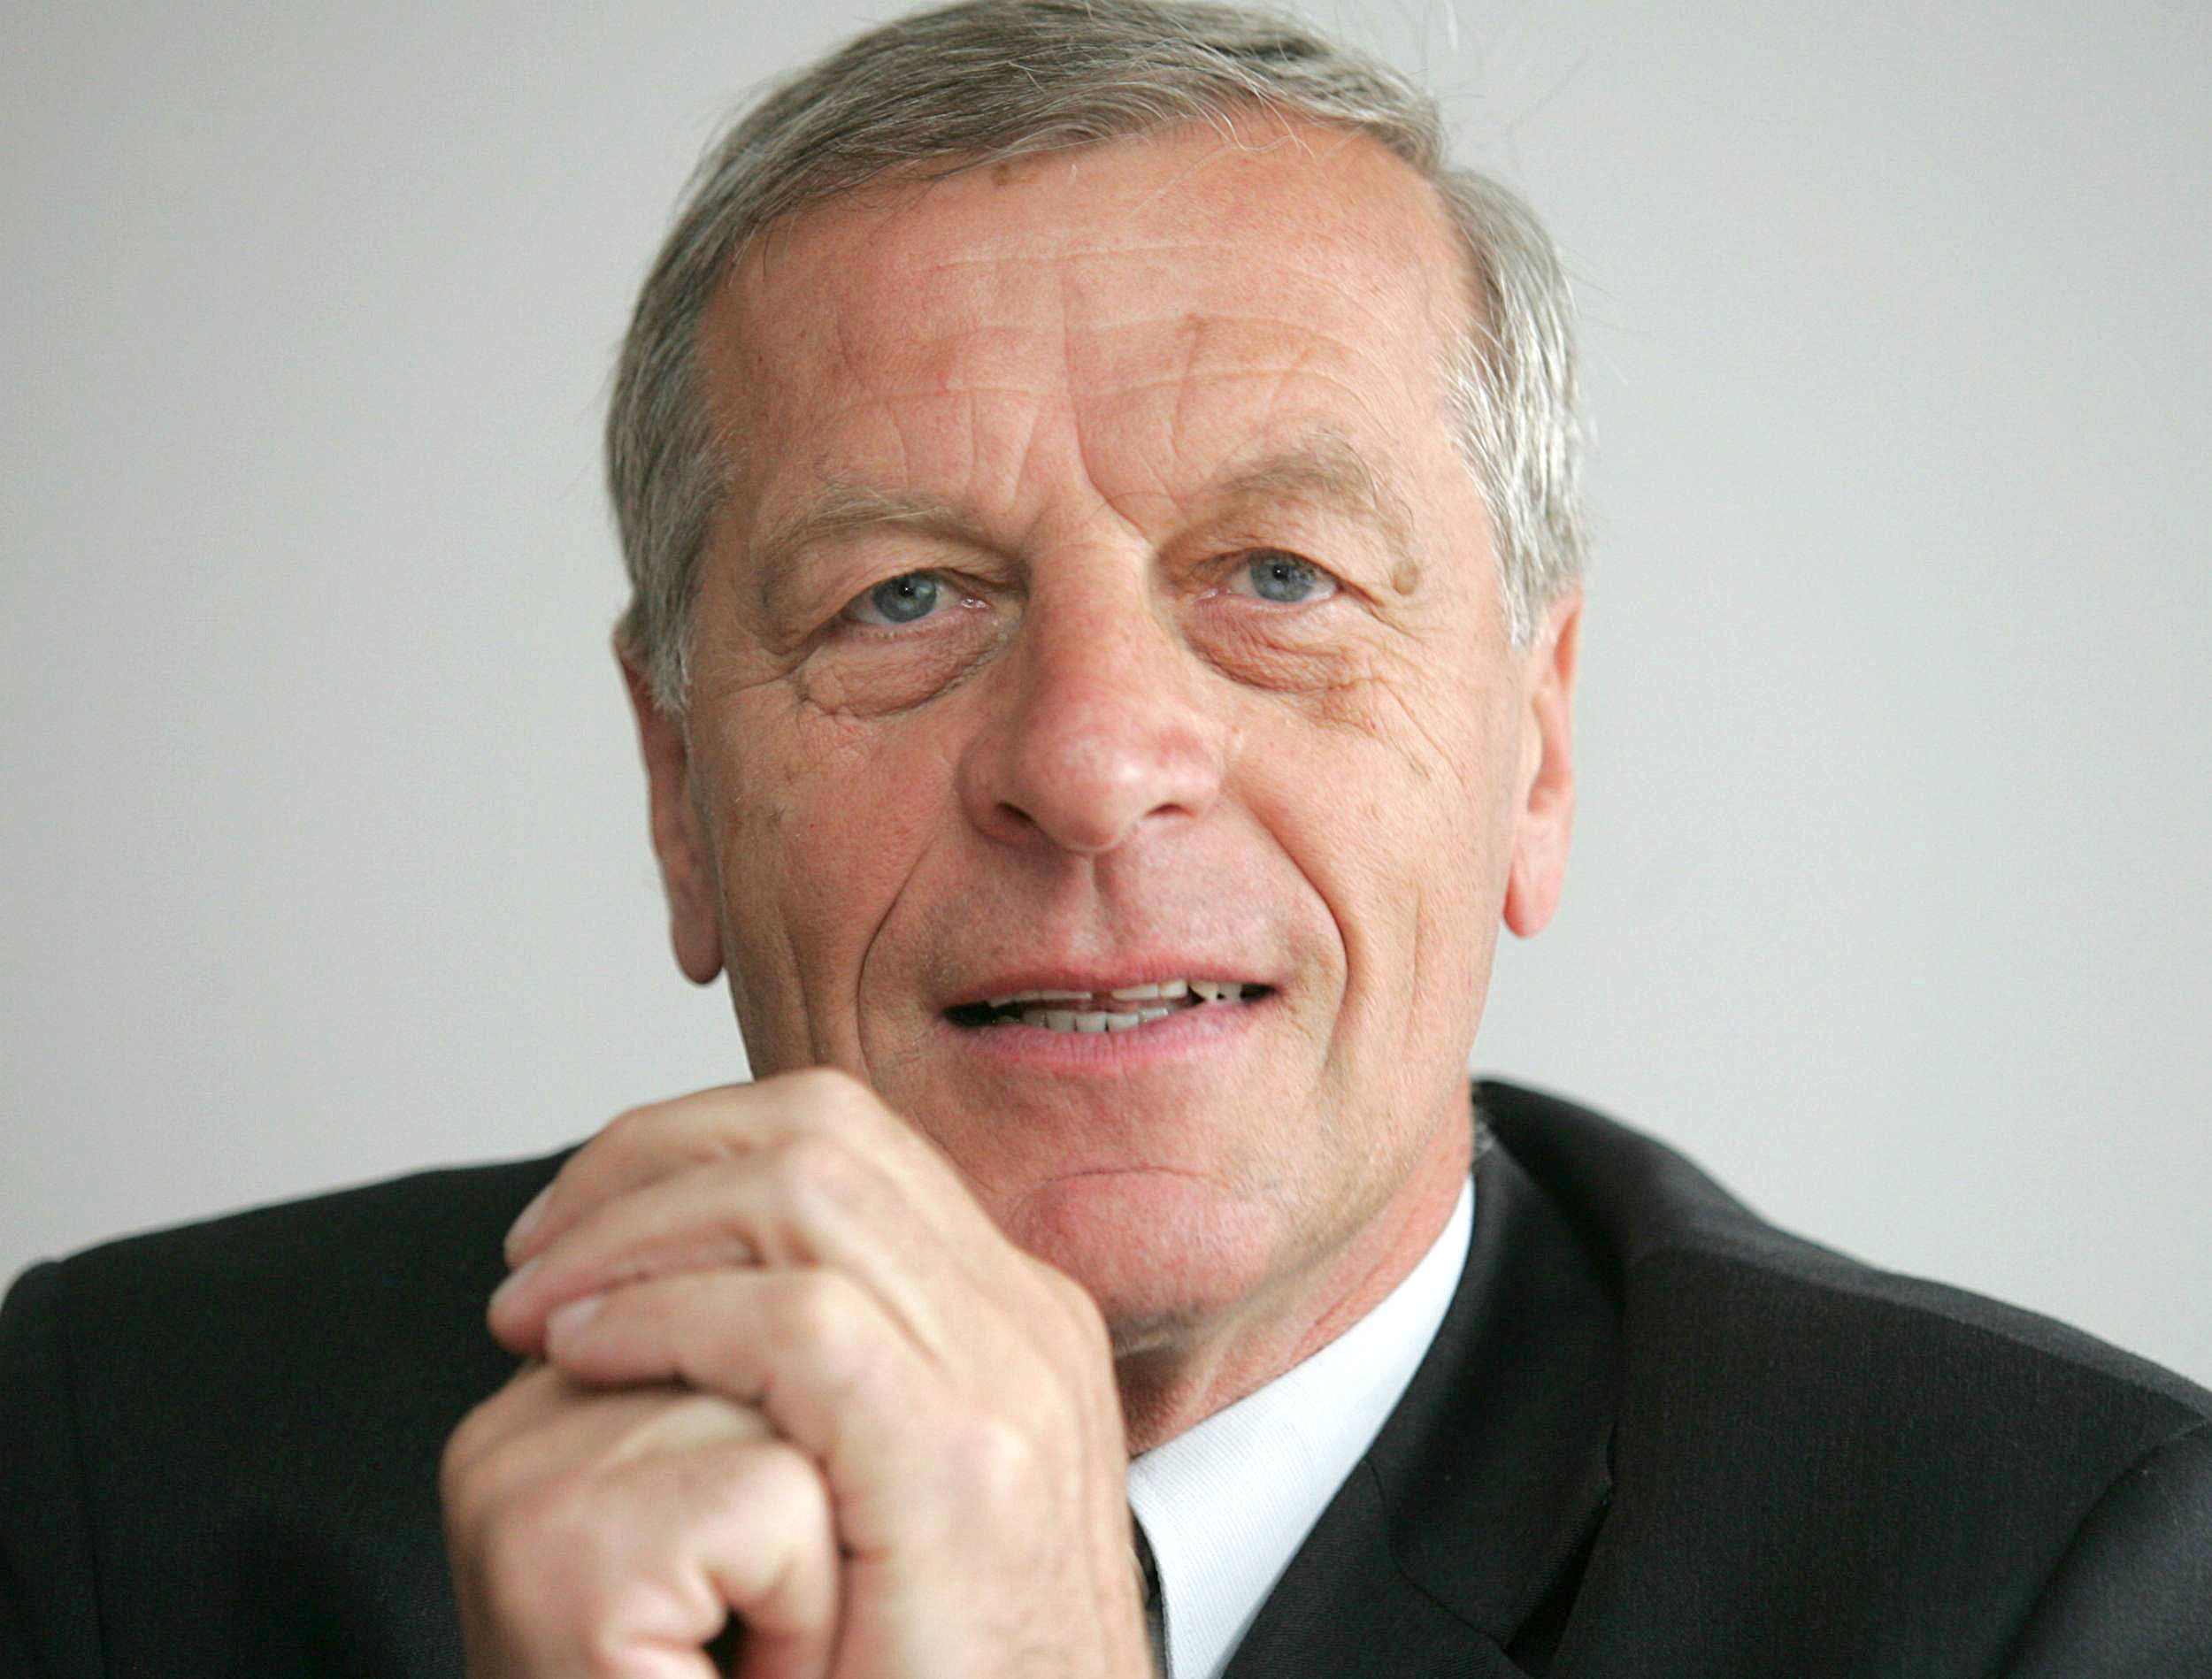 Janez Čadež